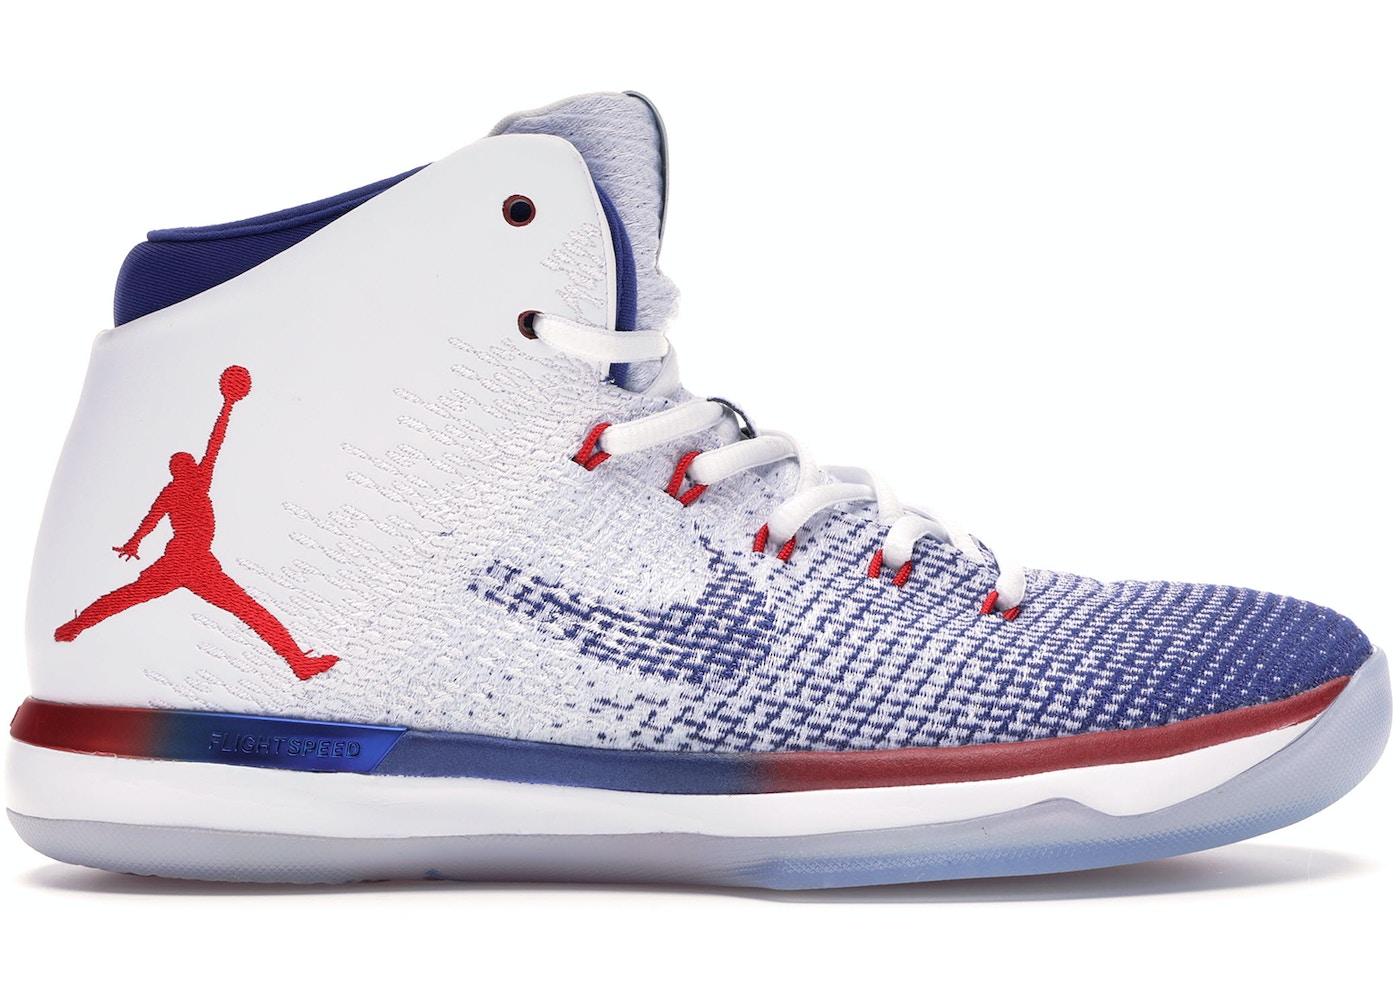 buy popular 57190 fd84c Air Jordan 31 Shoes - Average Sale Price